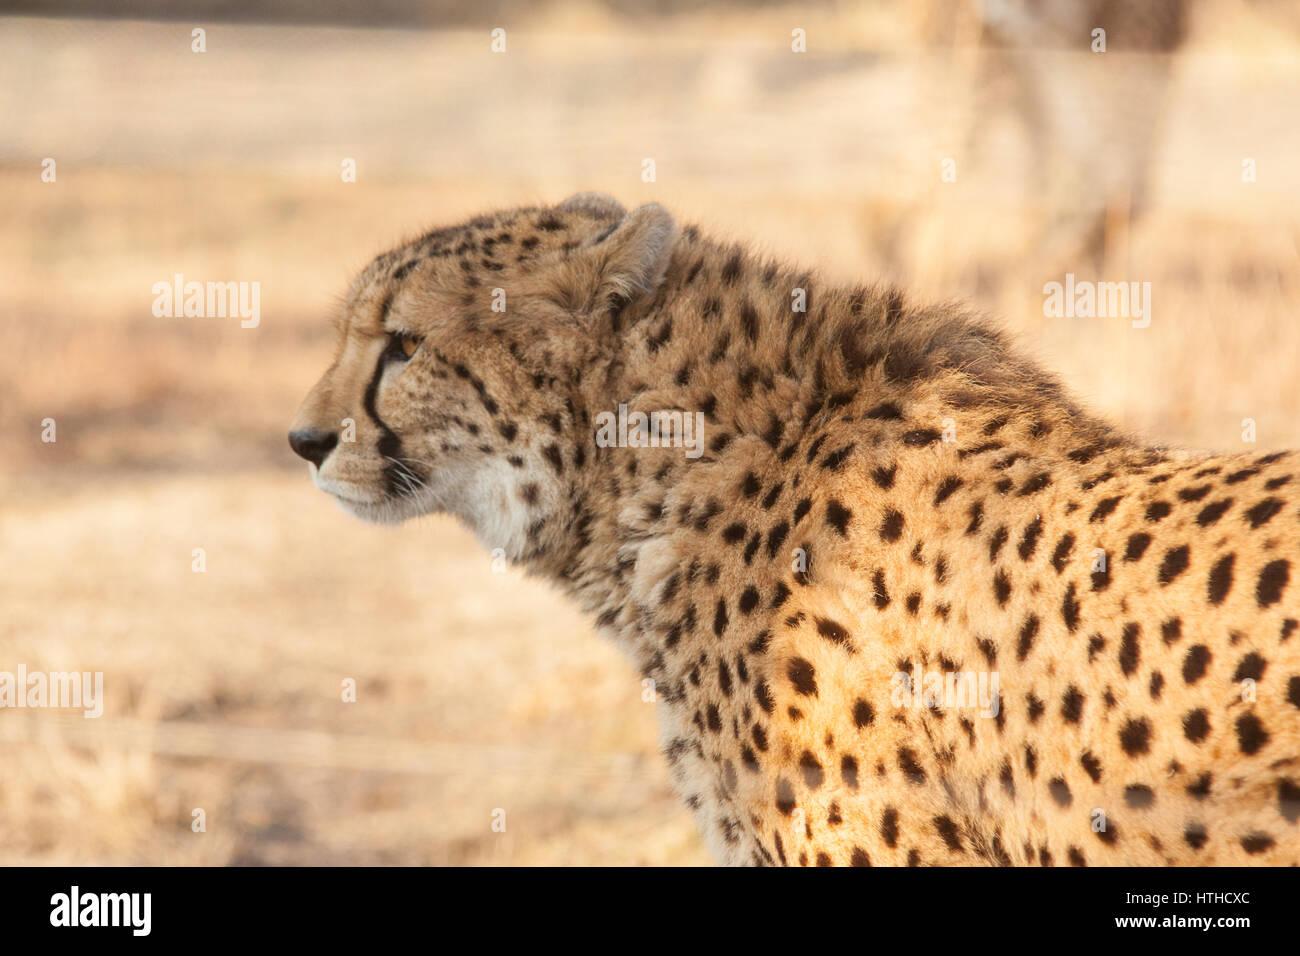 Cheetah at Vienna Zoo, Tierpark Schoenbrunn, Vienna, Austria, Europe. - Stock Image